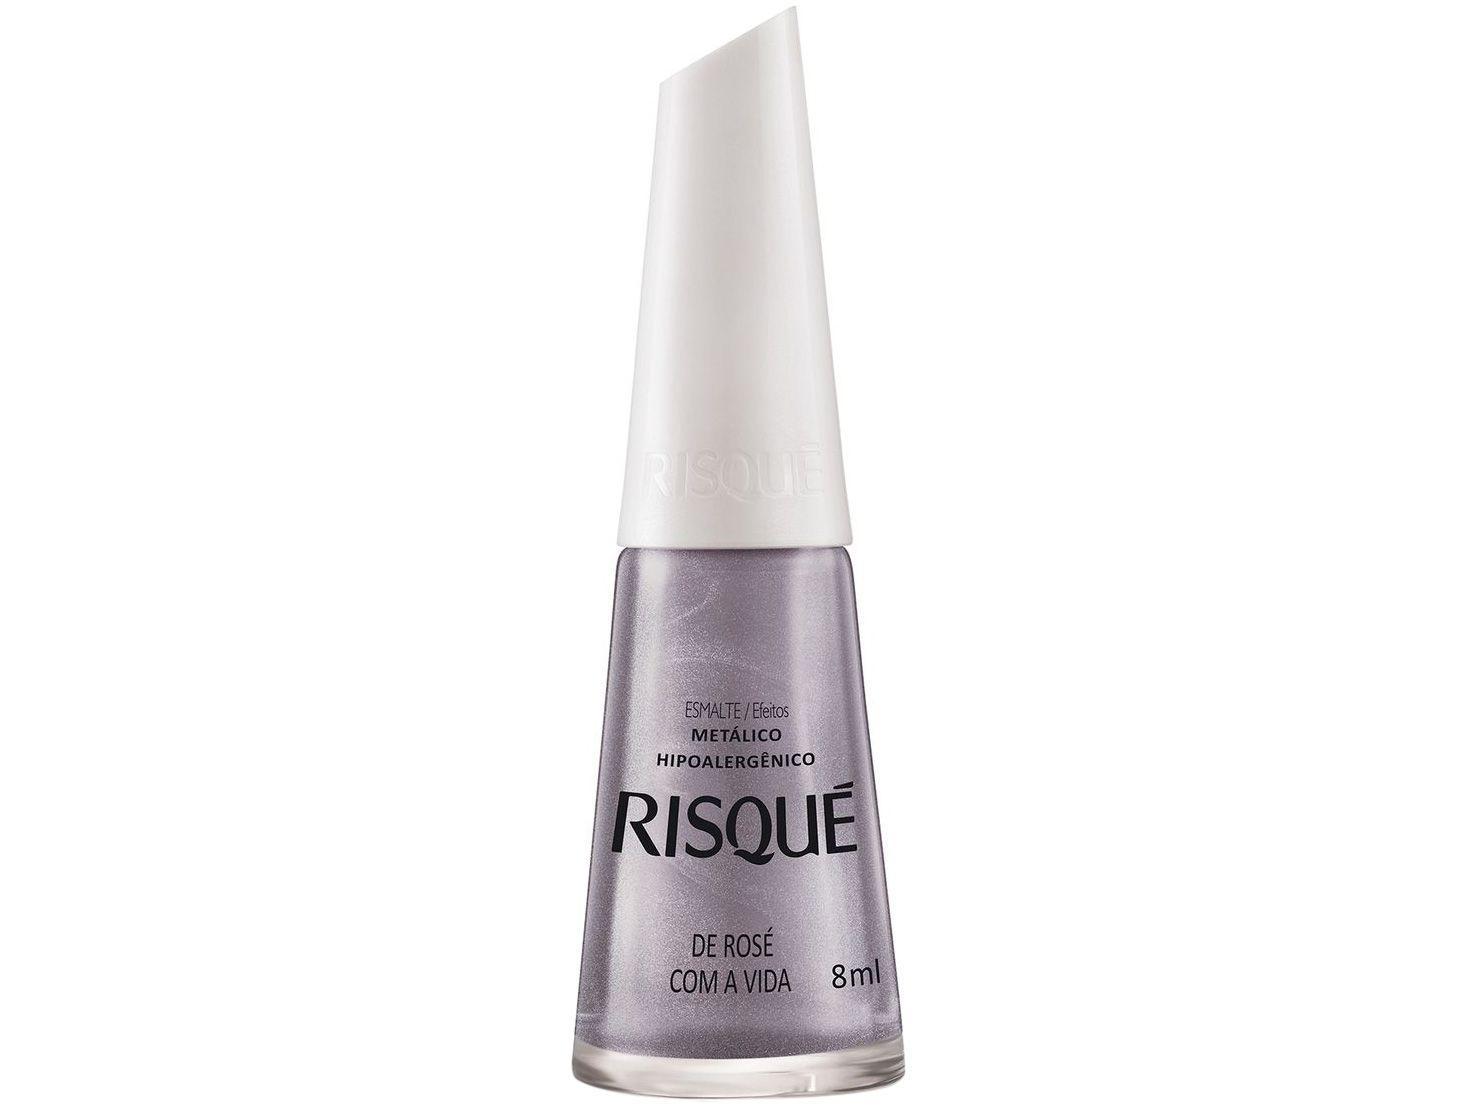 Esmalte Risqué De Rosé com a Vida Metálico - Hipoalergênico 8ml